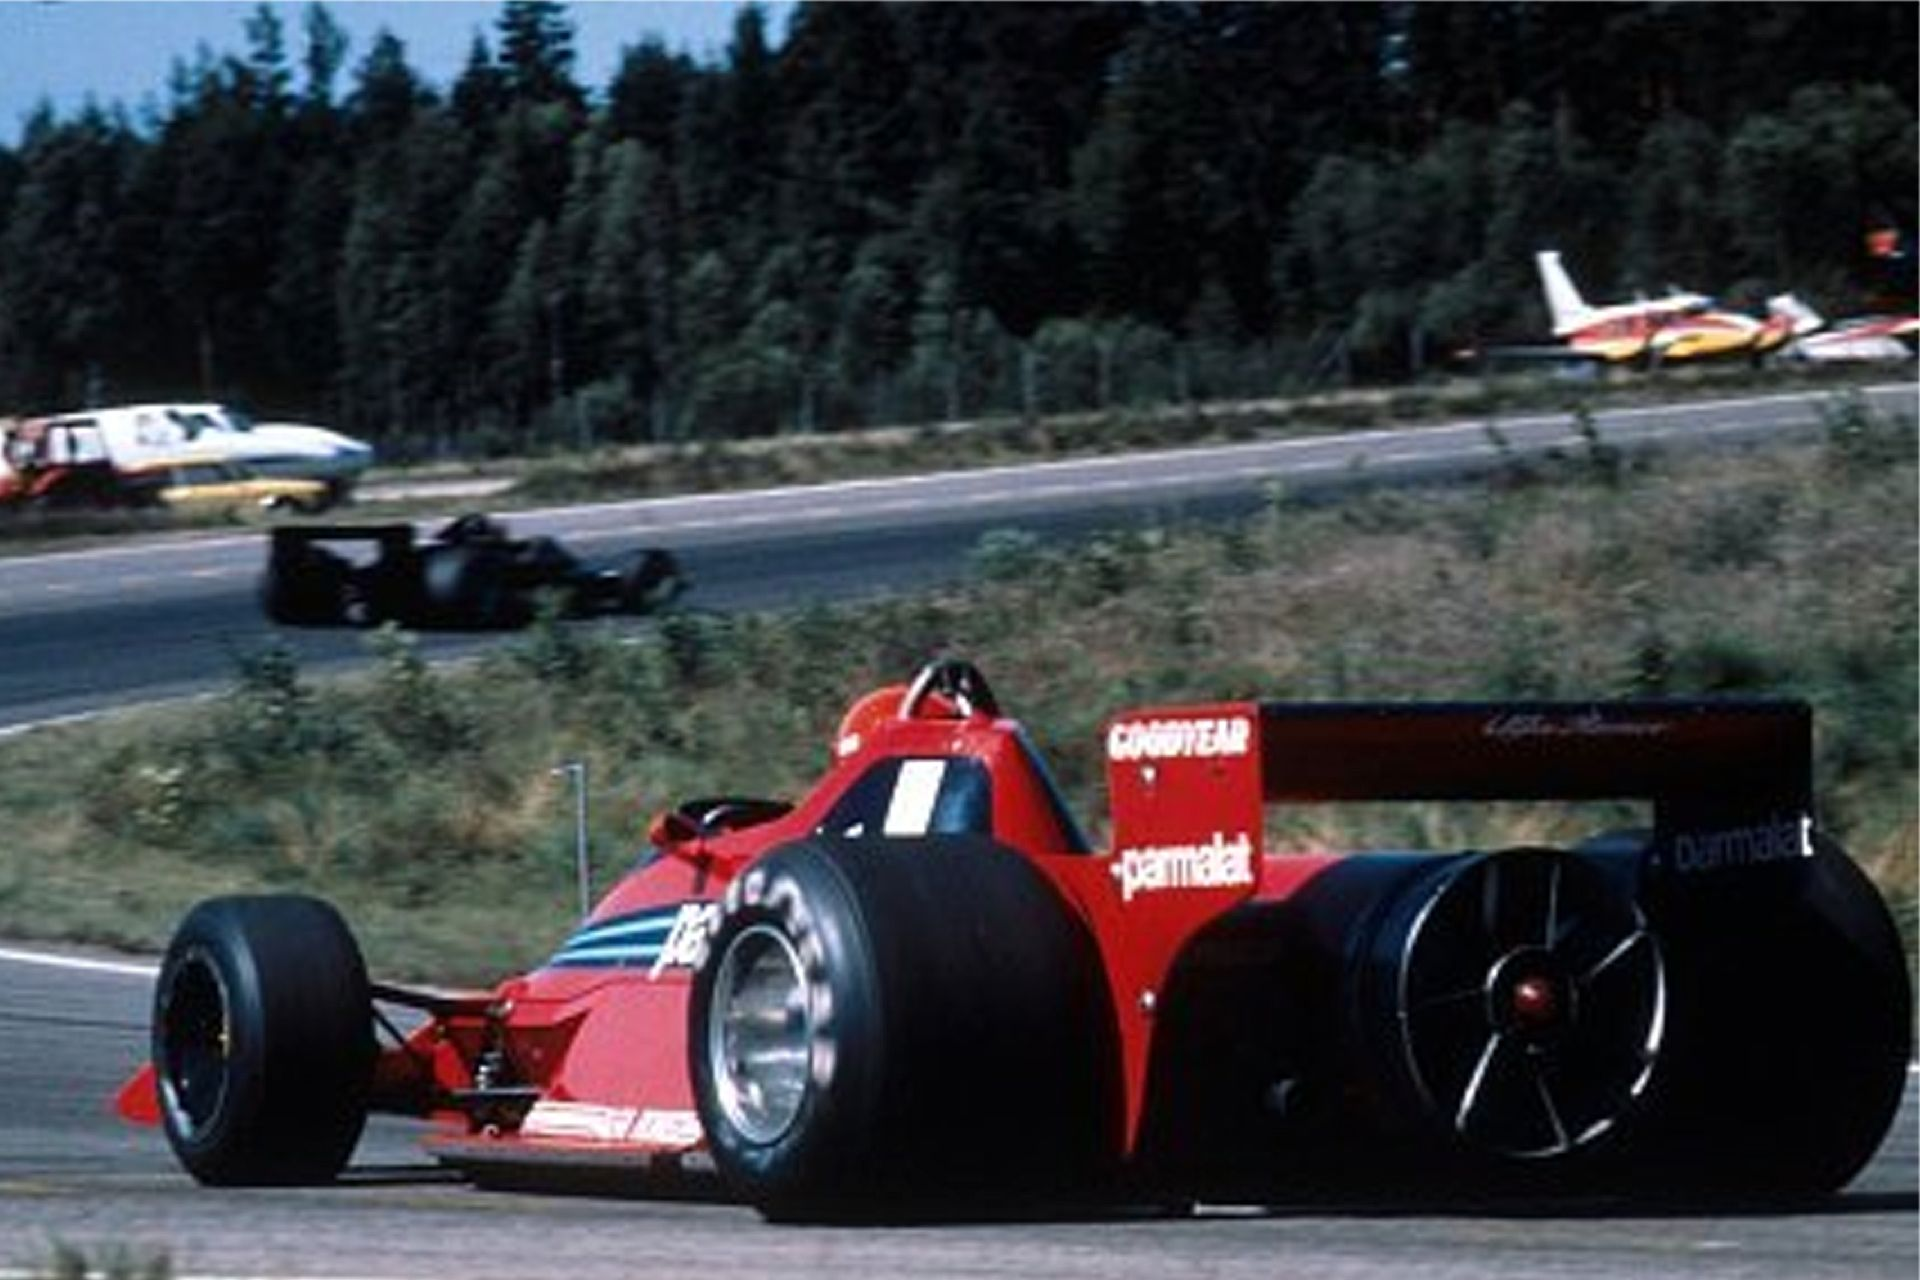 Winning Sucks - 1978 Brabham BT46B